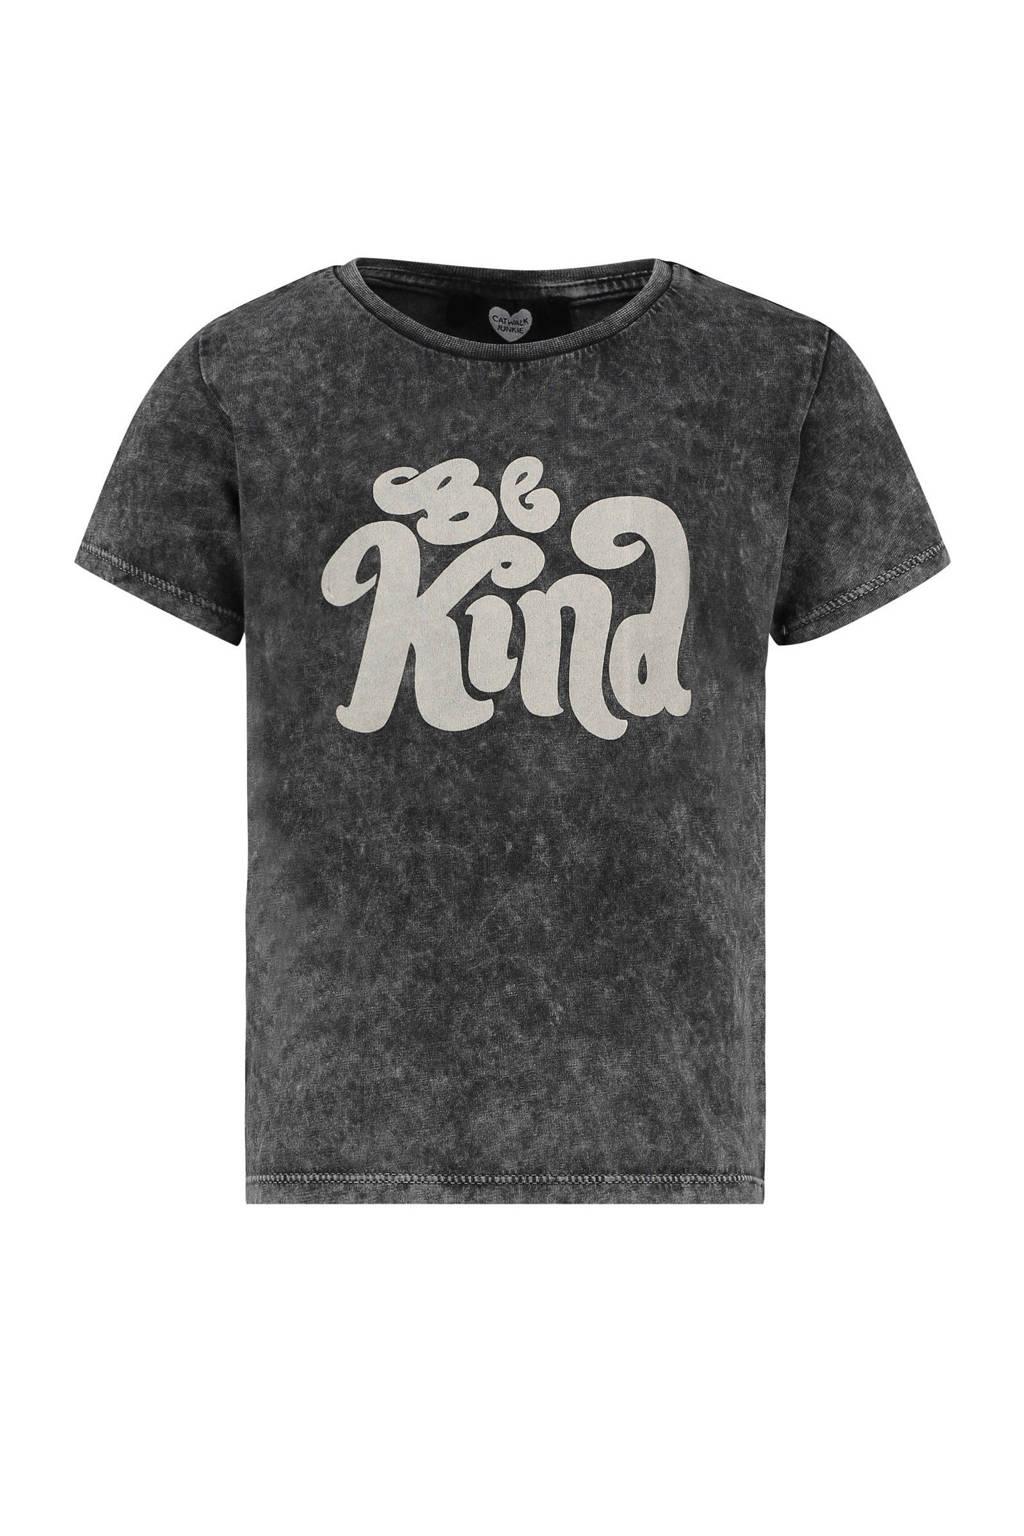 Catwalk Junkie x Huismuts T-shirt met tekst zwart, Zwart